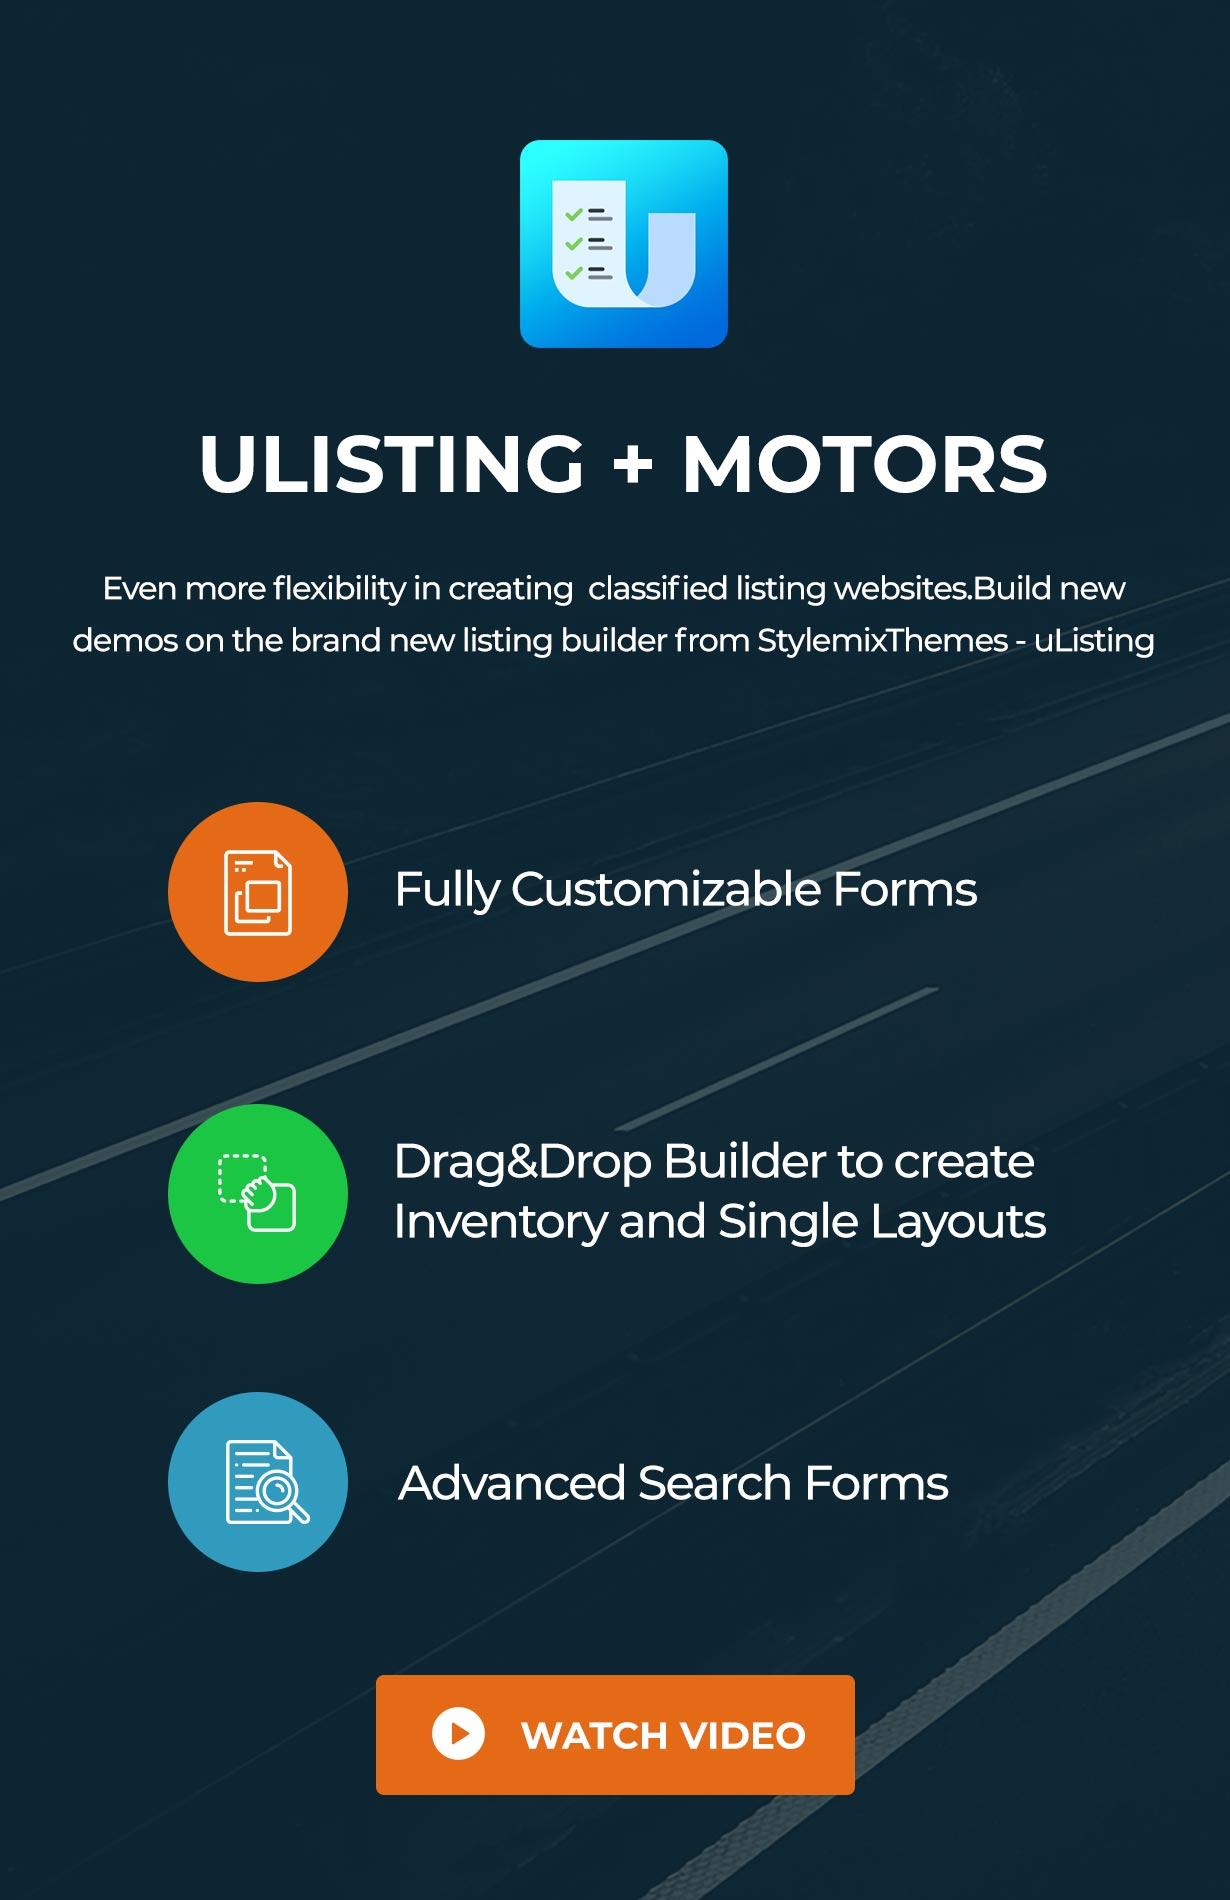 ulisting - Motors - Car Dealer, Rental & Classifieds WordPress theme